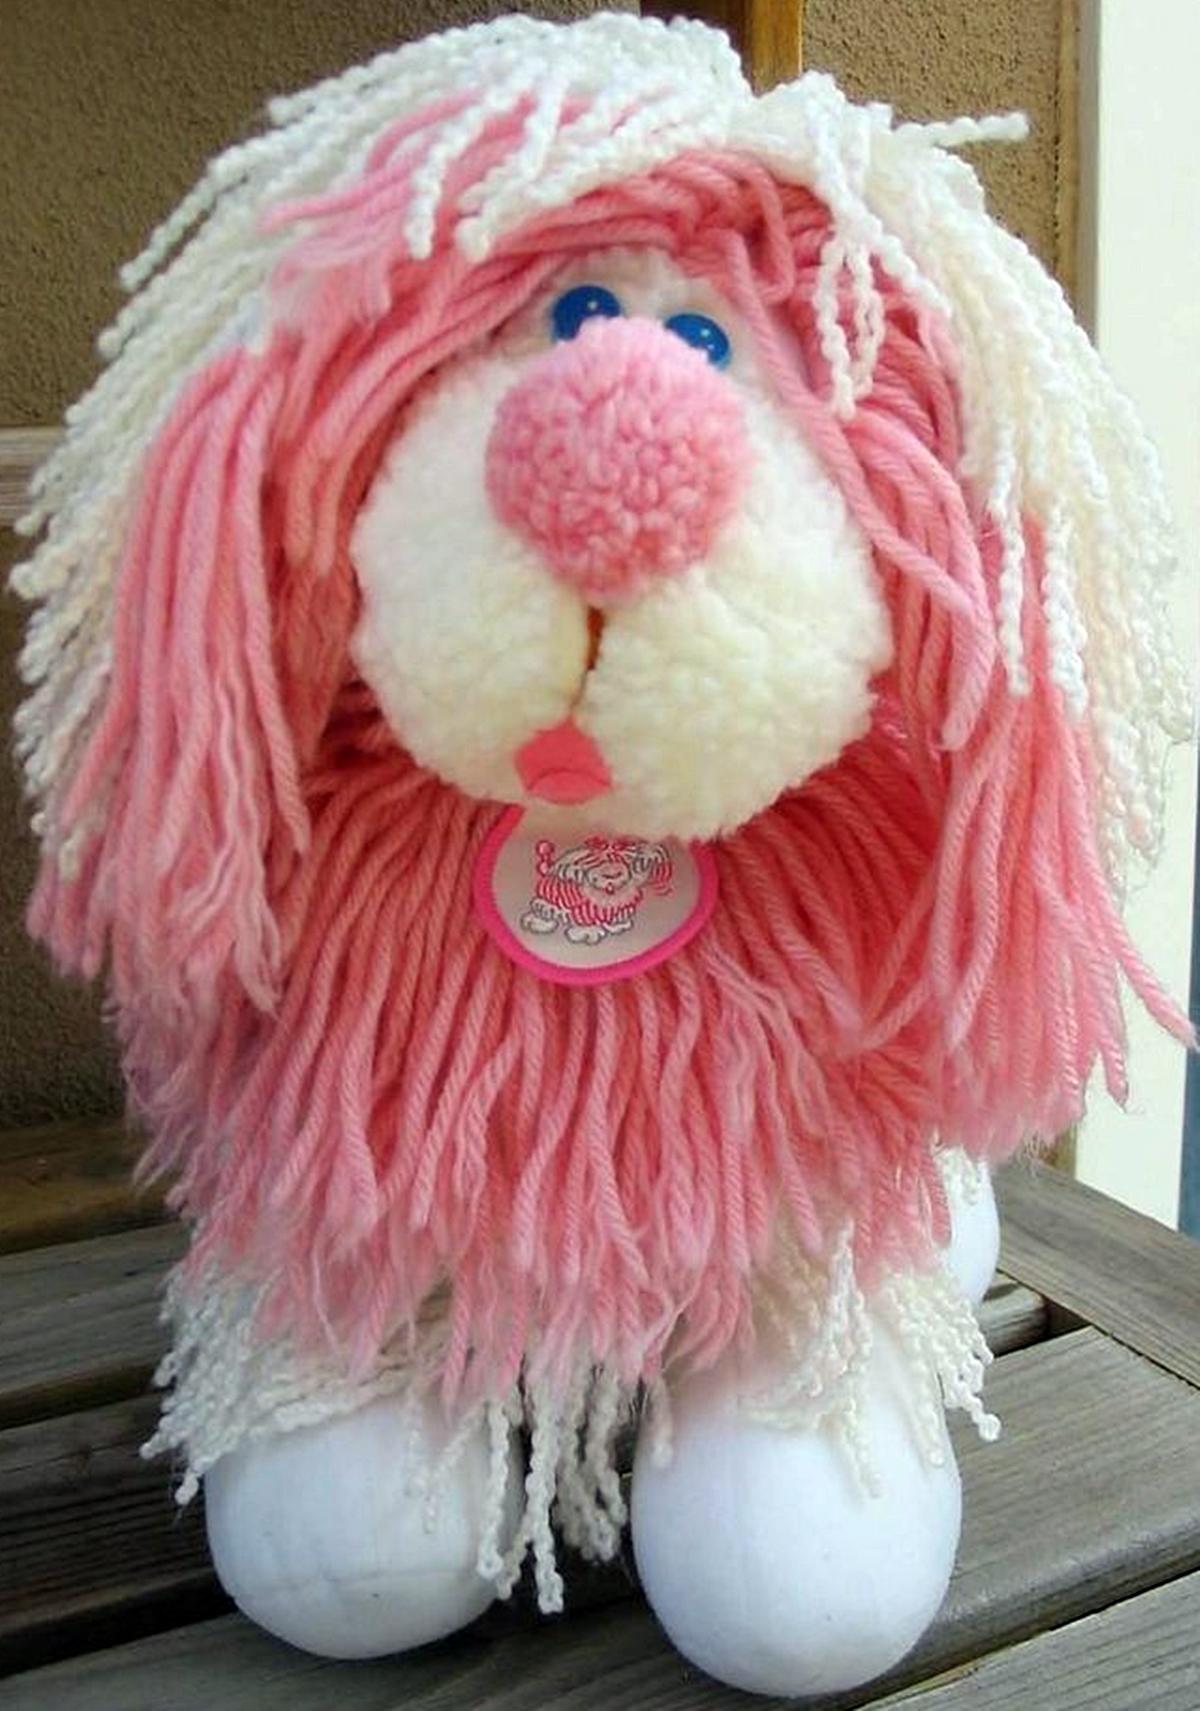 A Fluppy Dog toy